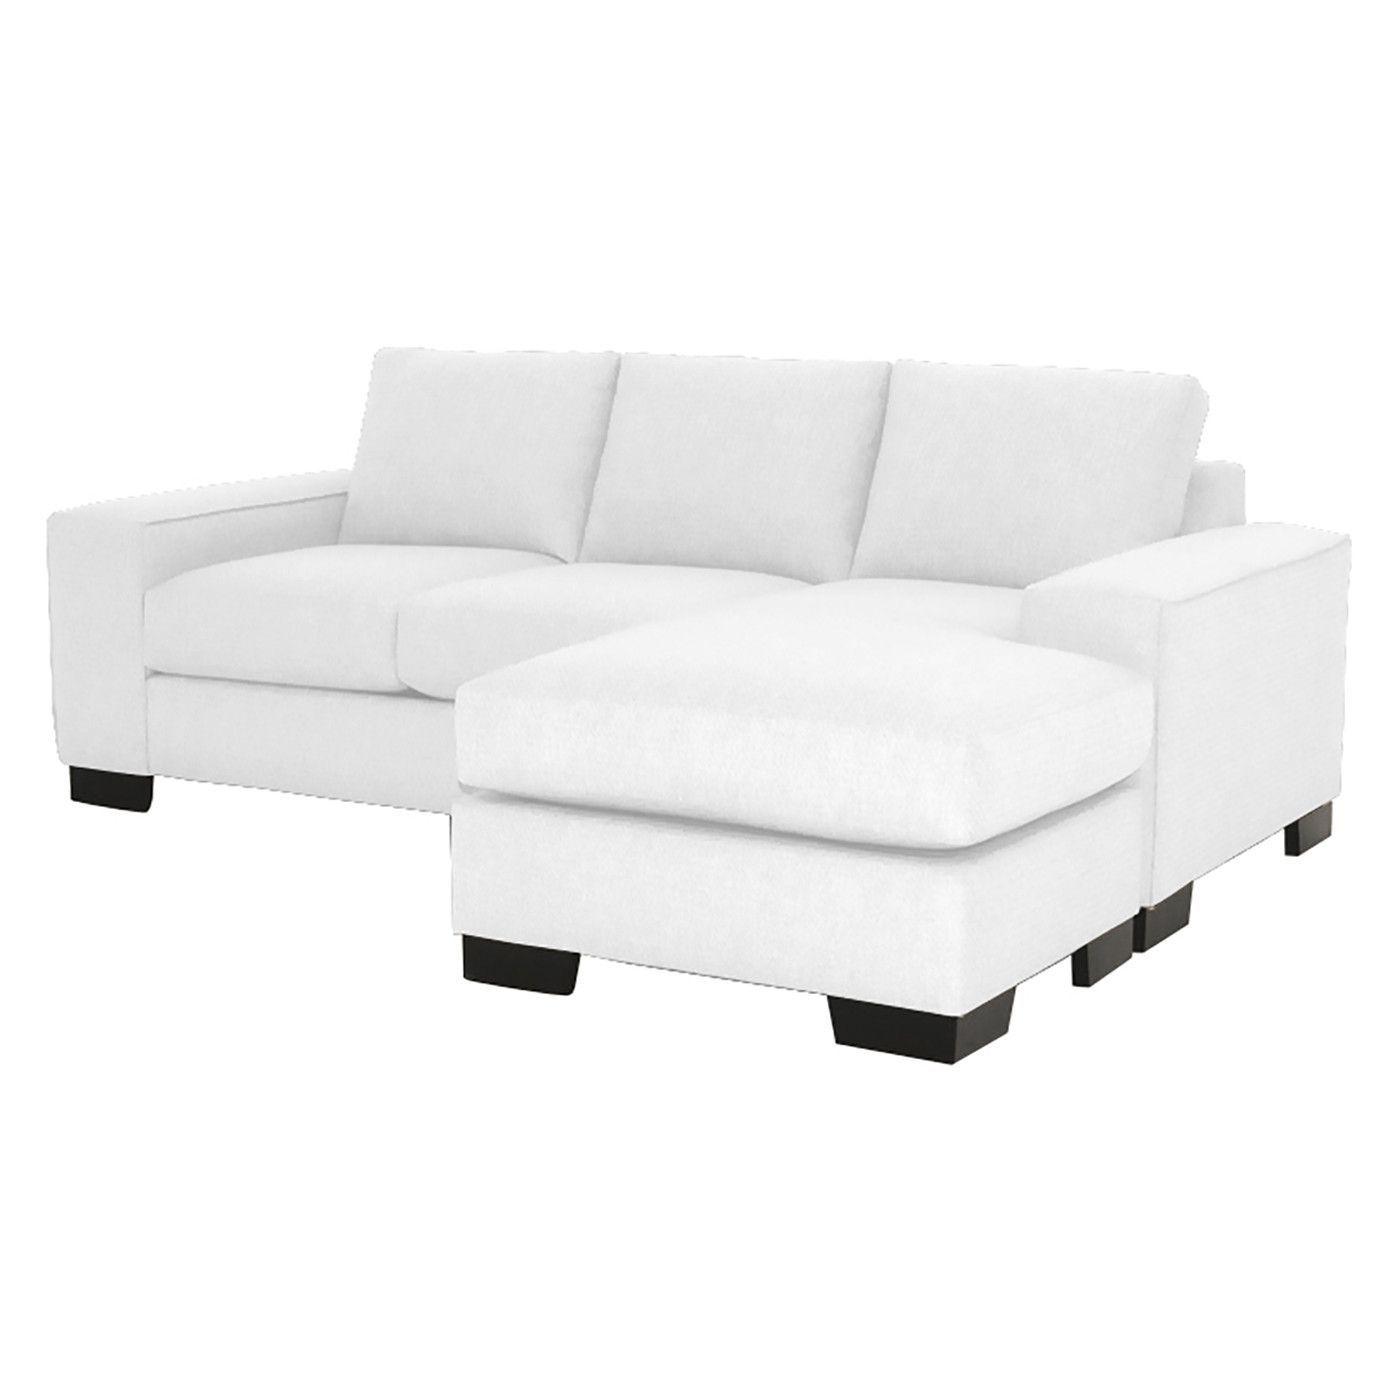 Catchy Modern Sectional Sleeper Sofa Mesmerizing Sectional Sleeper Sofa Image